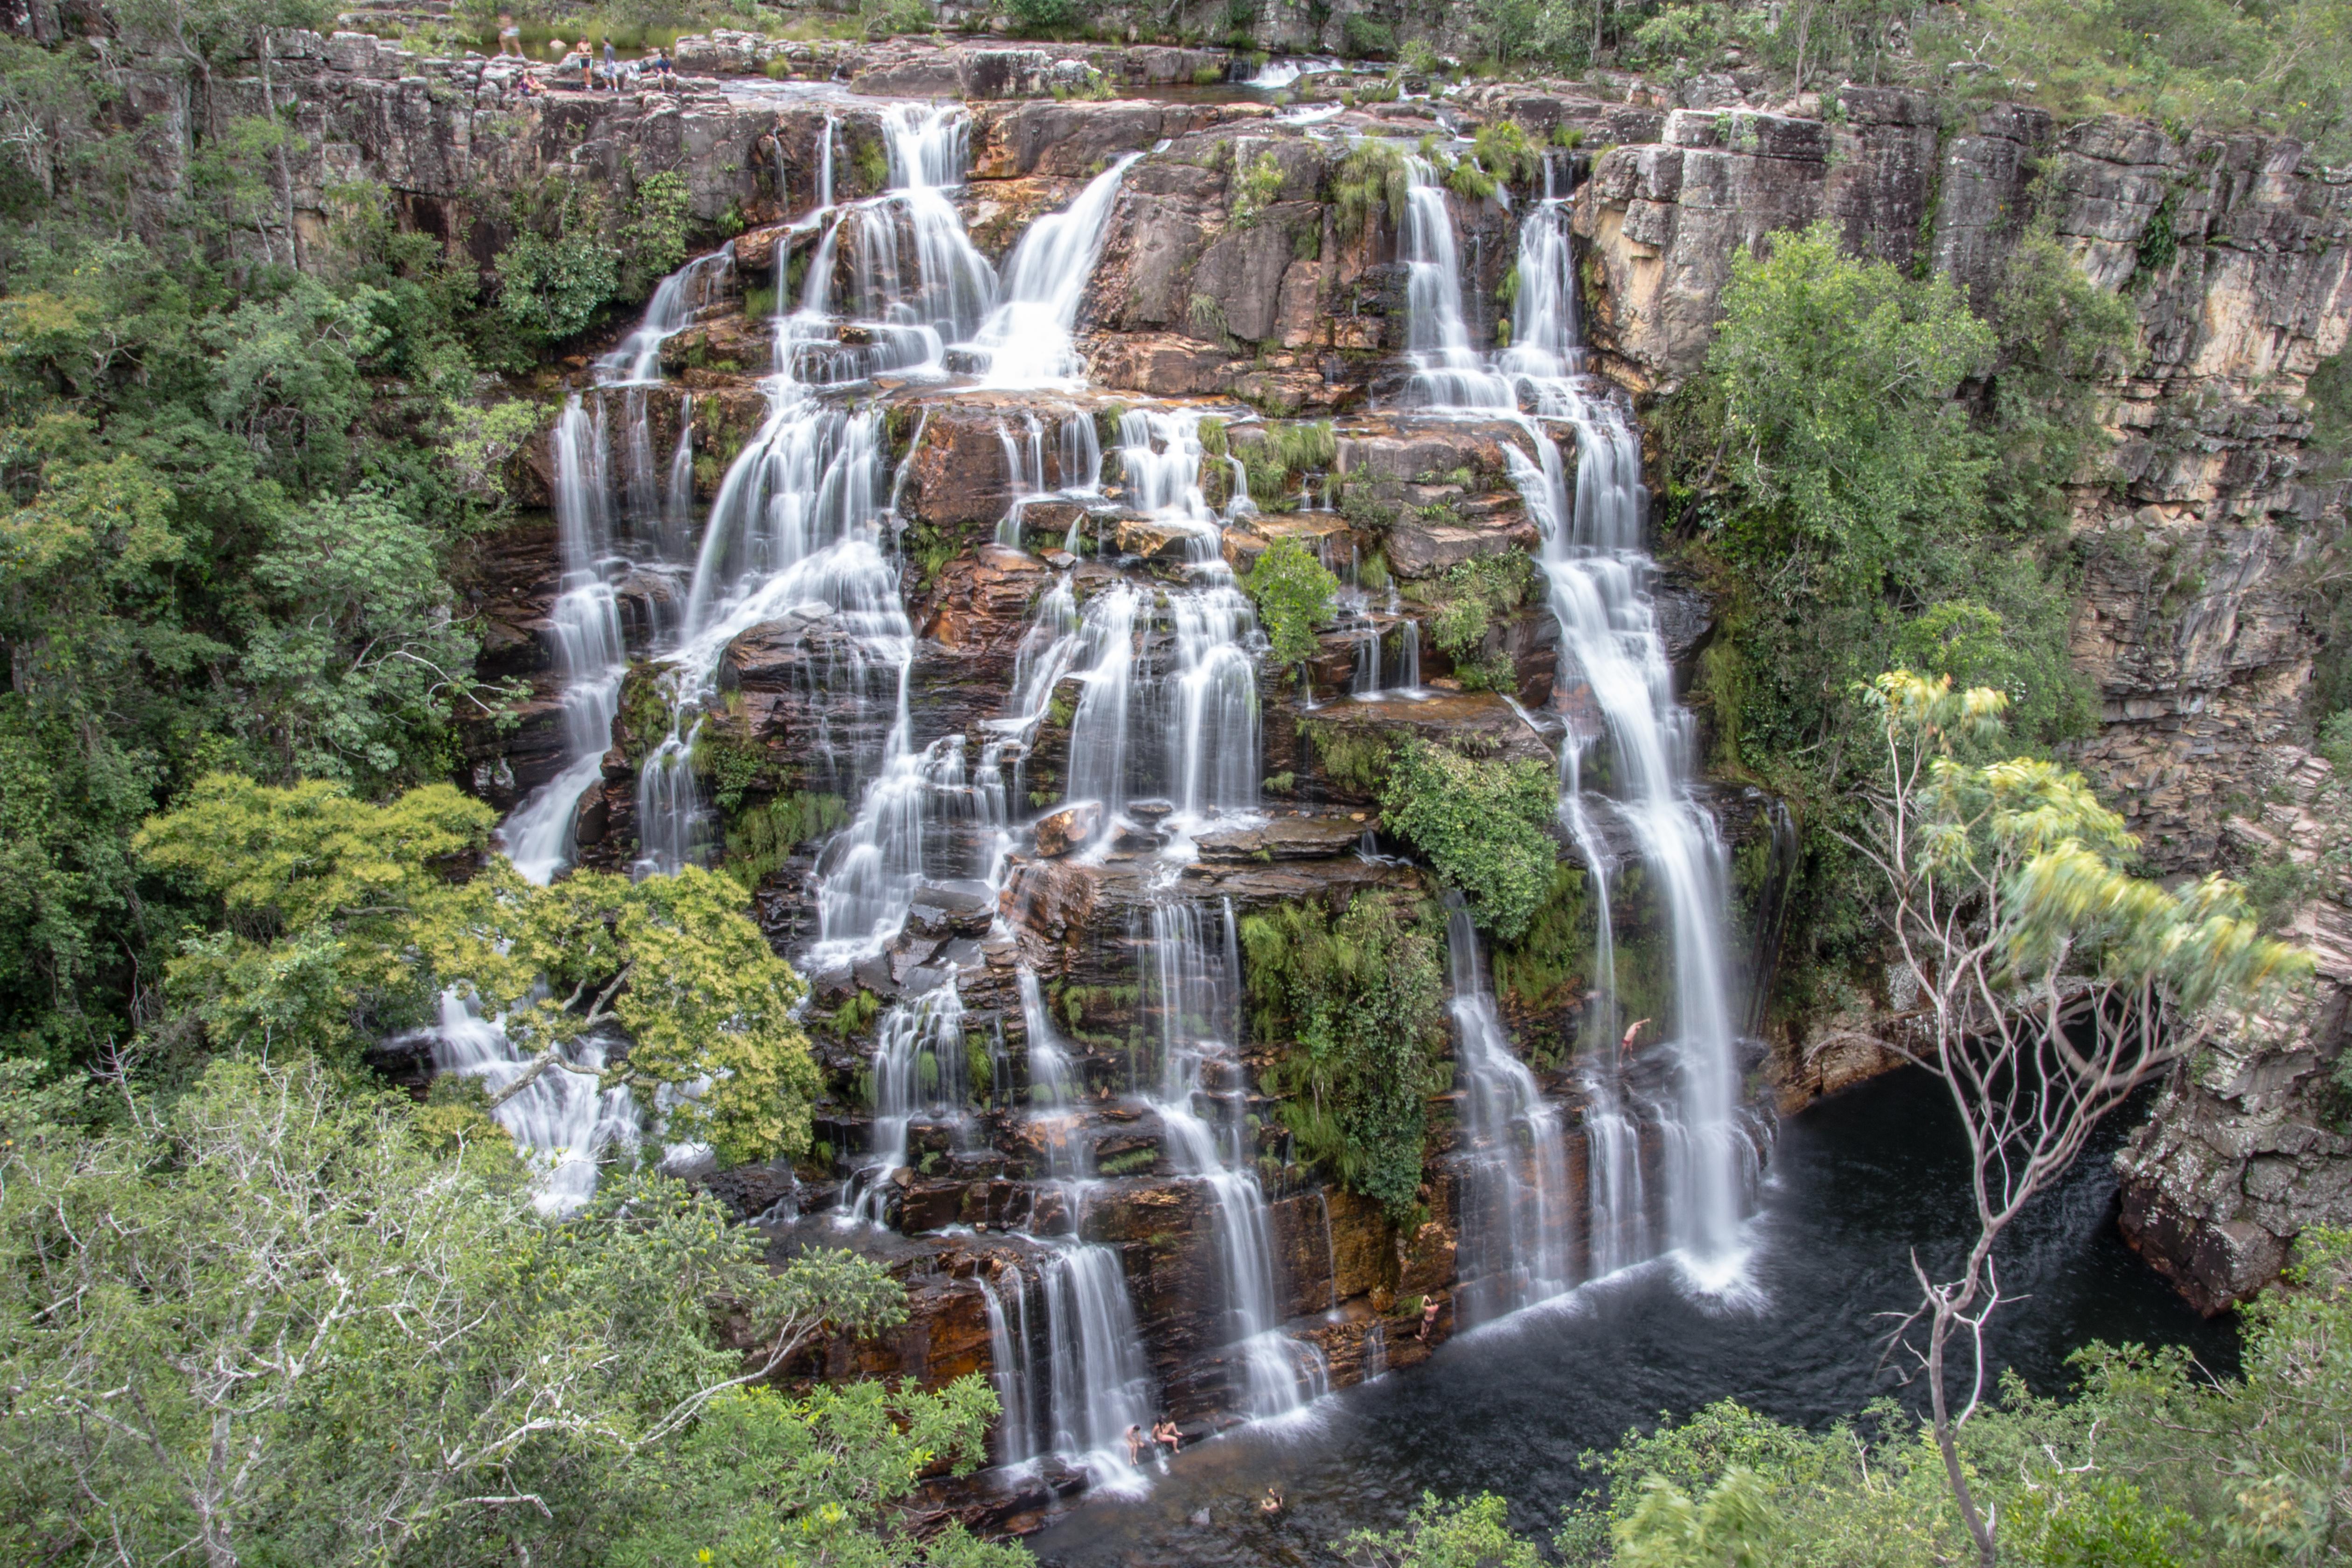 Cachoeira Almecegas I